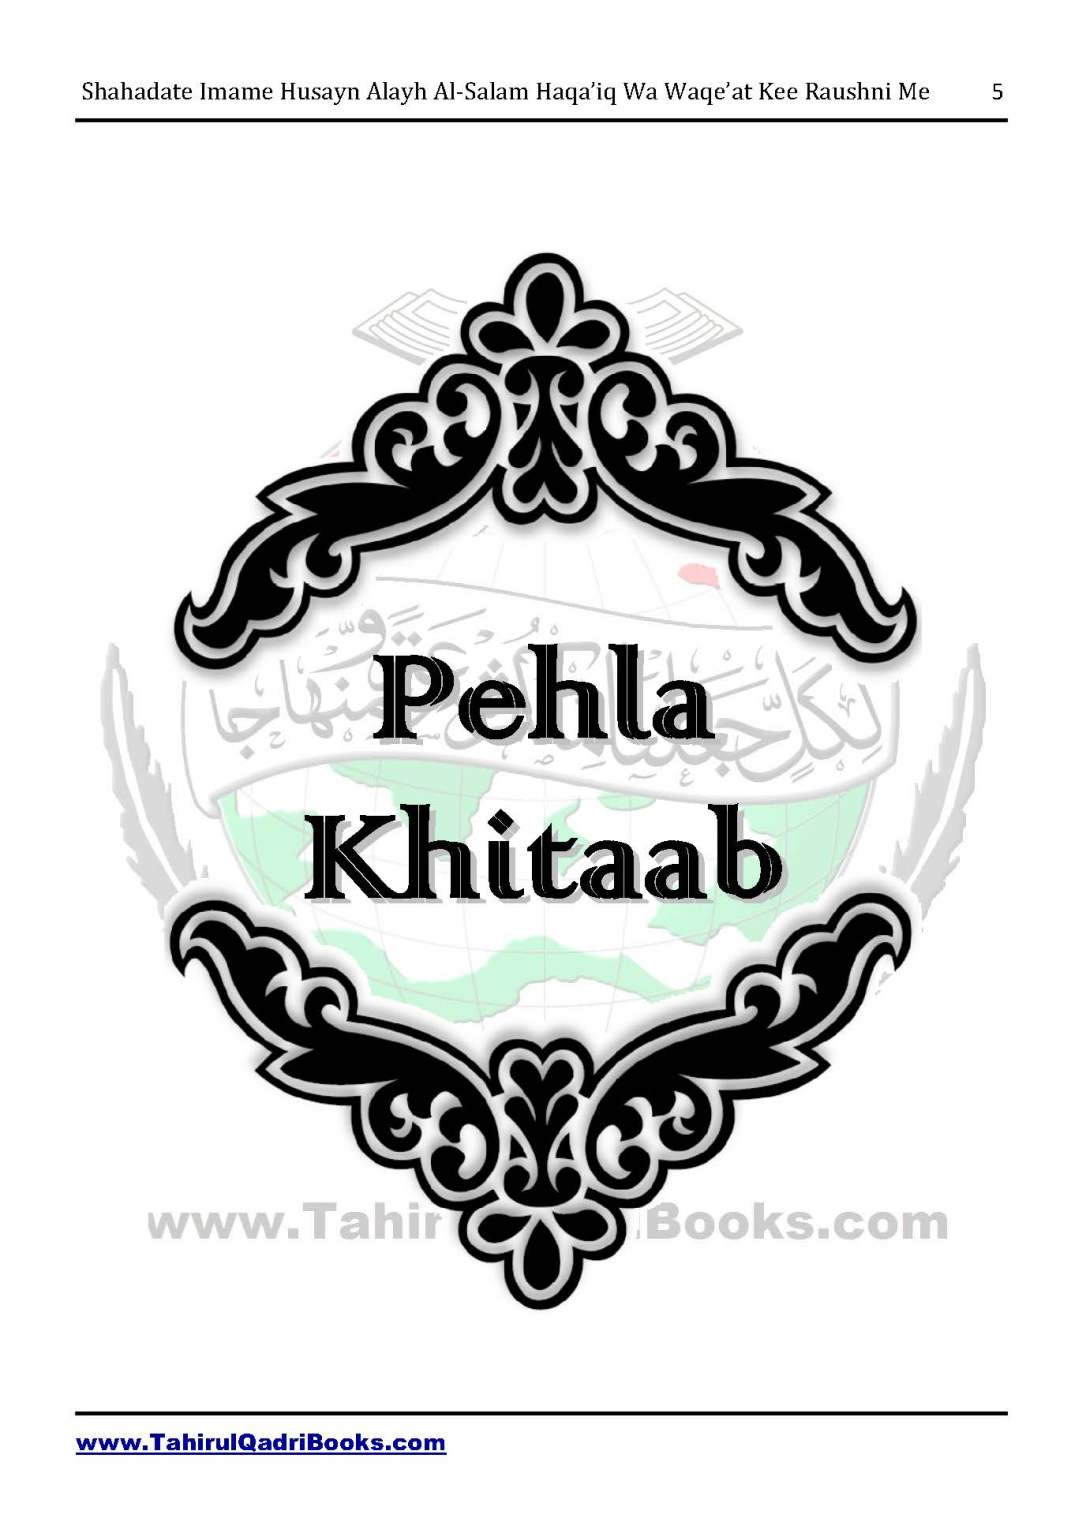 shahadate-imame-husayn-alayh-is-salam-haqaiq-wa-waqe_at-kee-raushni-me-in-roman-urdu-unlocked_Page_05